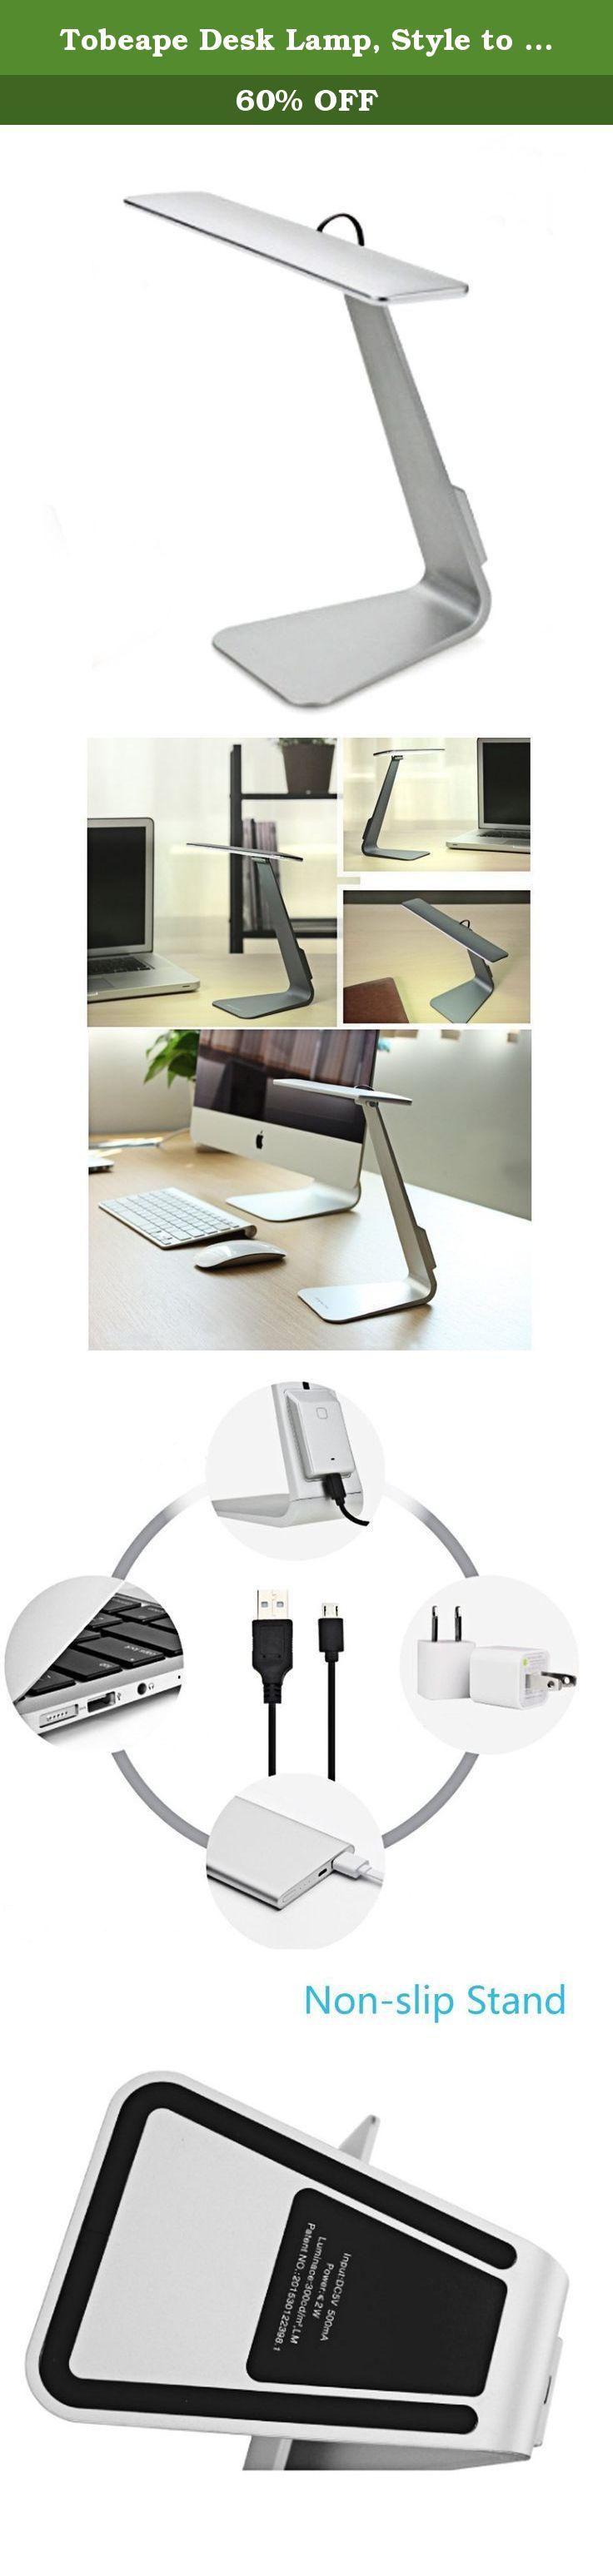 tobeape desk lamp style to match macbook ultra thin table lamp